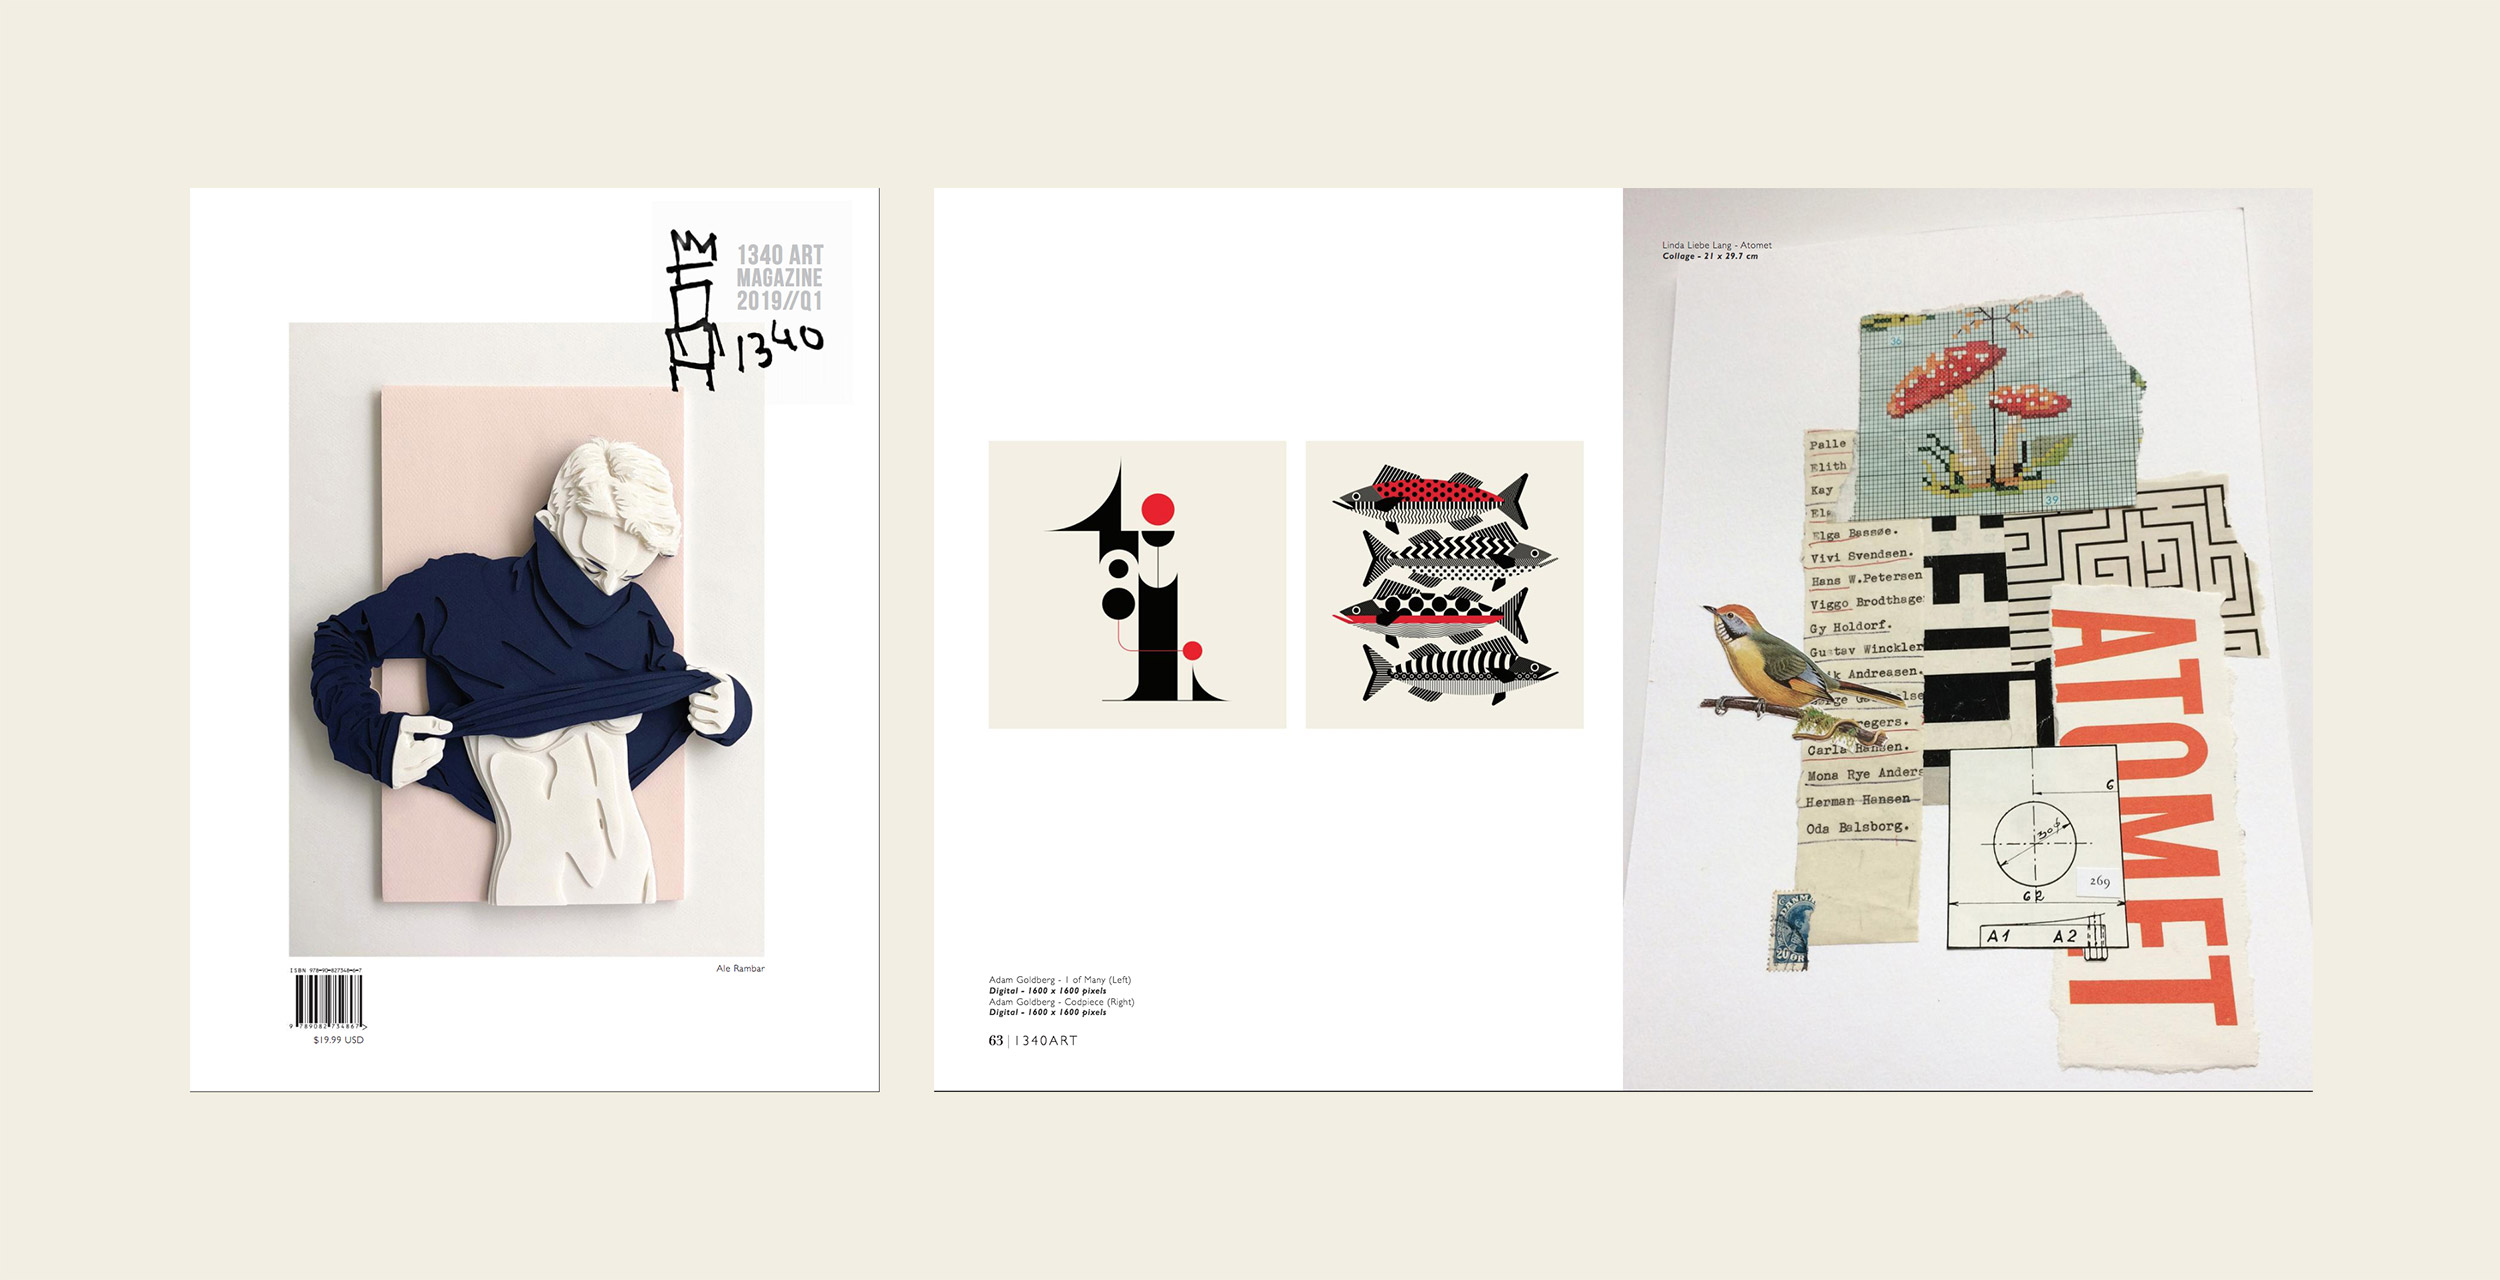 truf-creative-press-1340-Mag.jpg